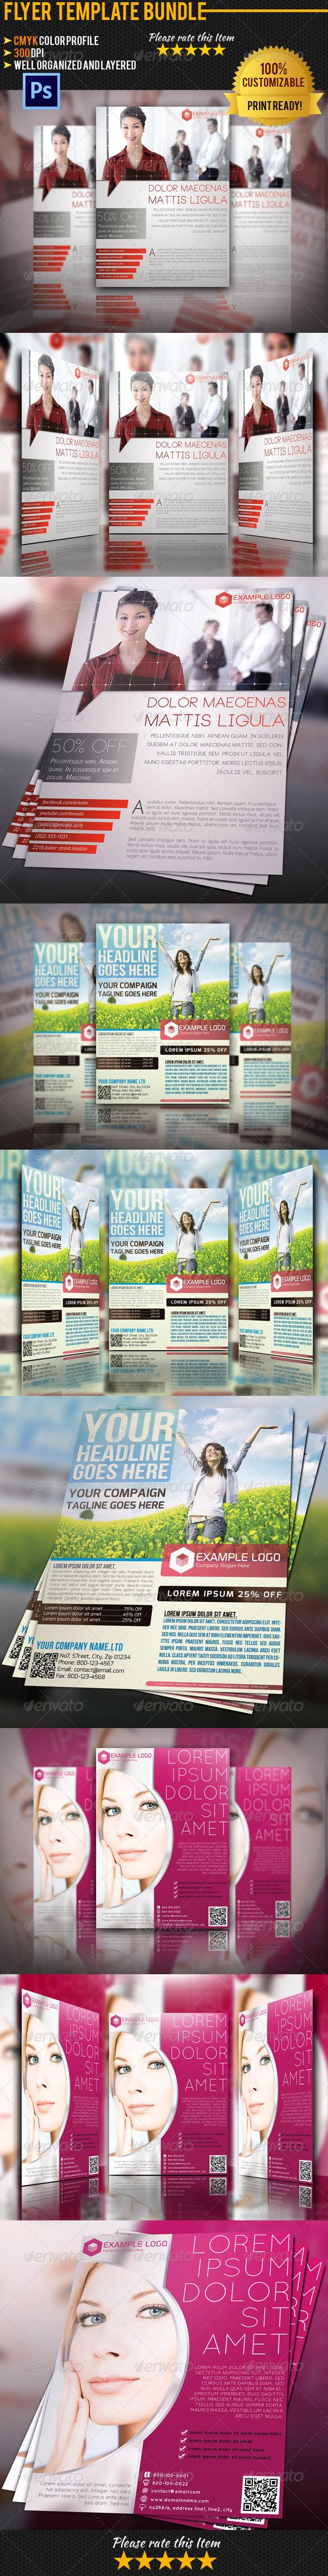 GraphicRiver Flyer Poster Bundle Vol.3 5710119